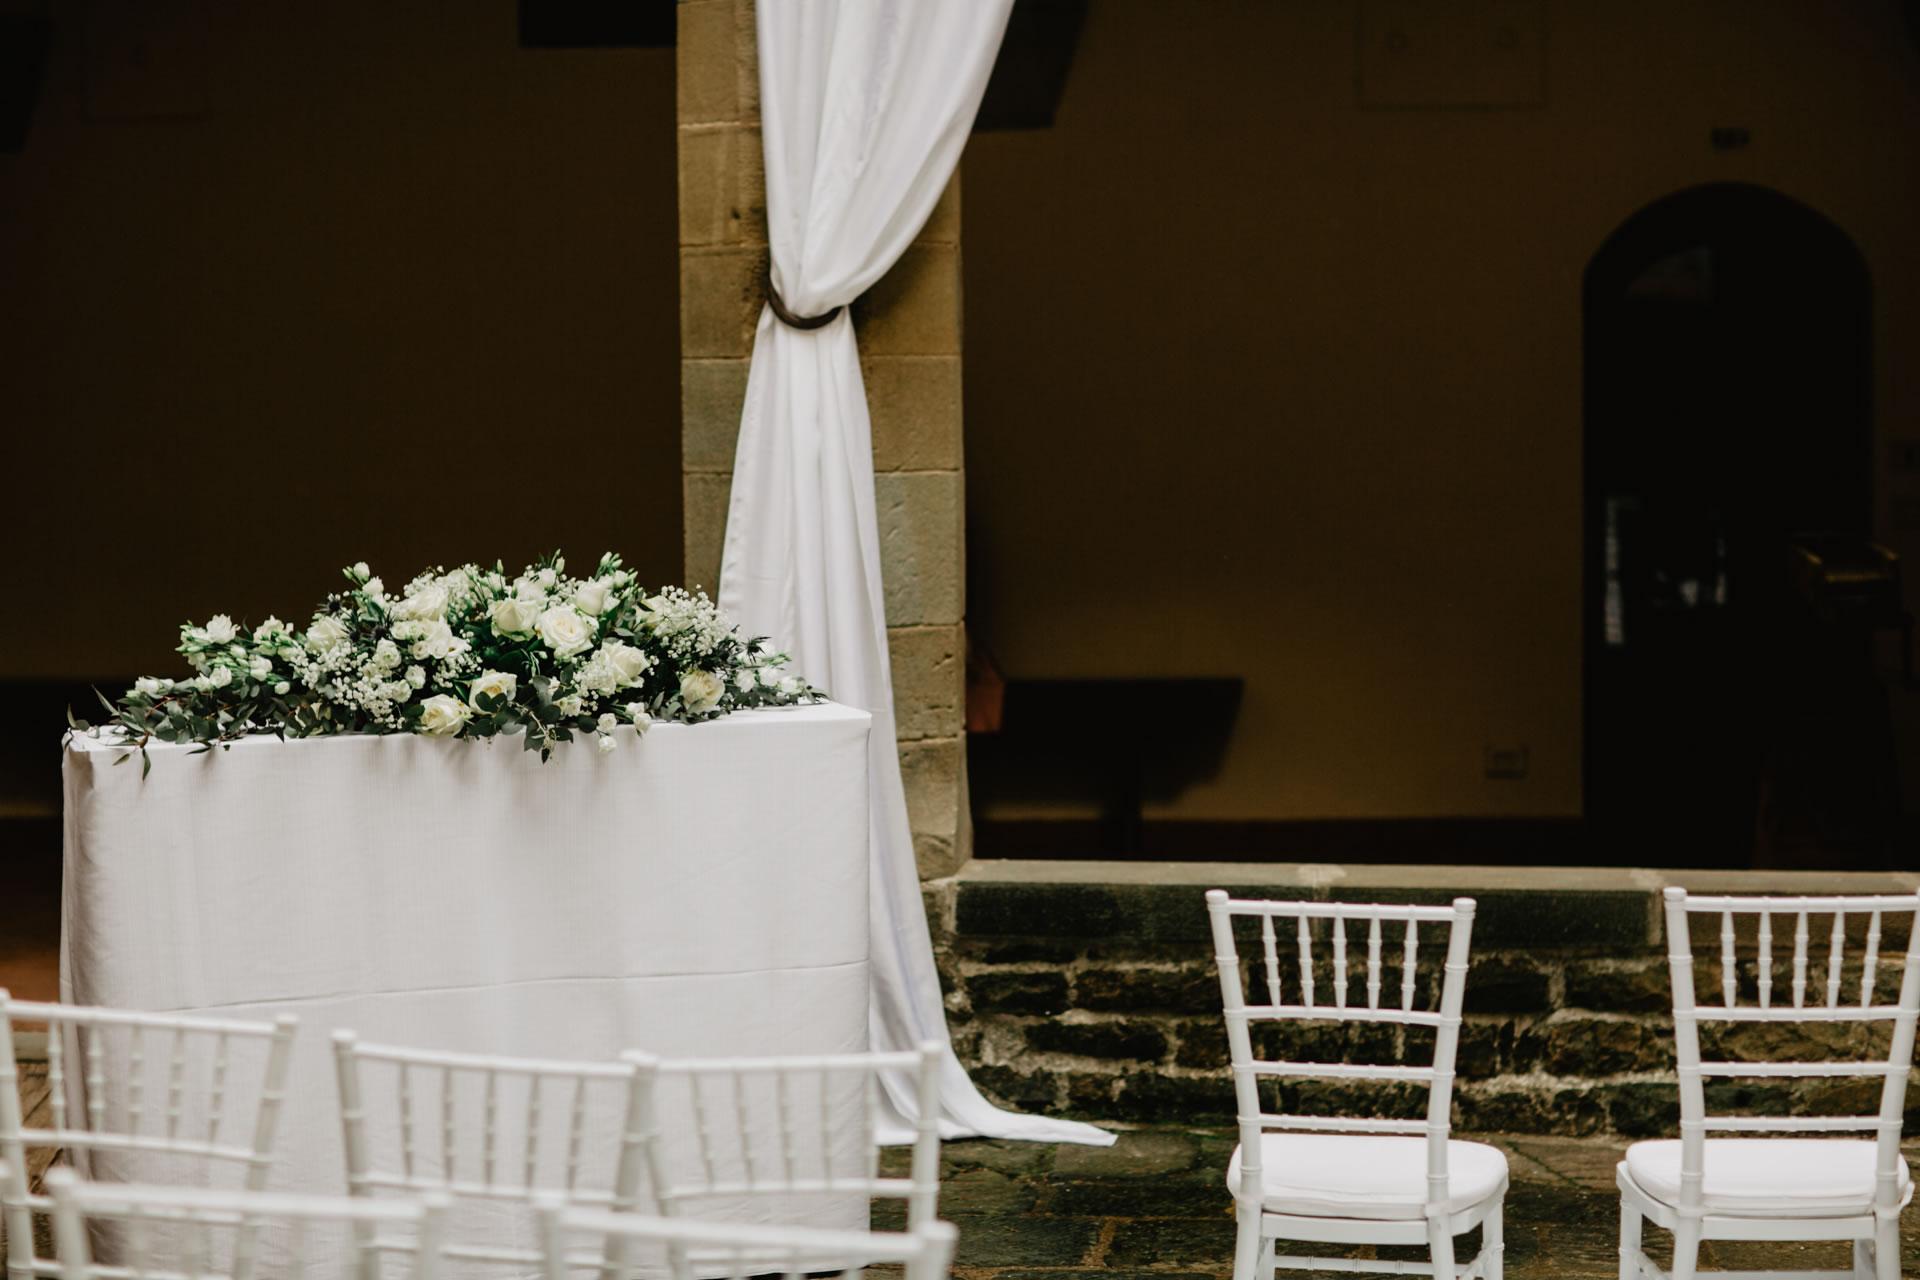 - 42 :: Indian wedding ceremony at Villa Pitiana :: Luxury wedding photography - 41 ::  - 42